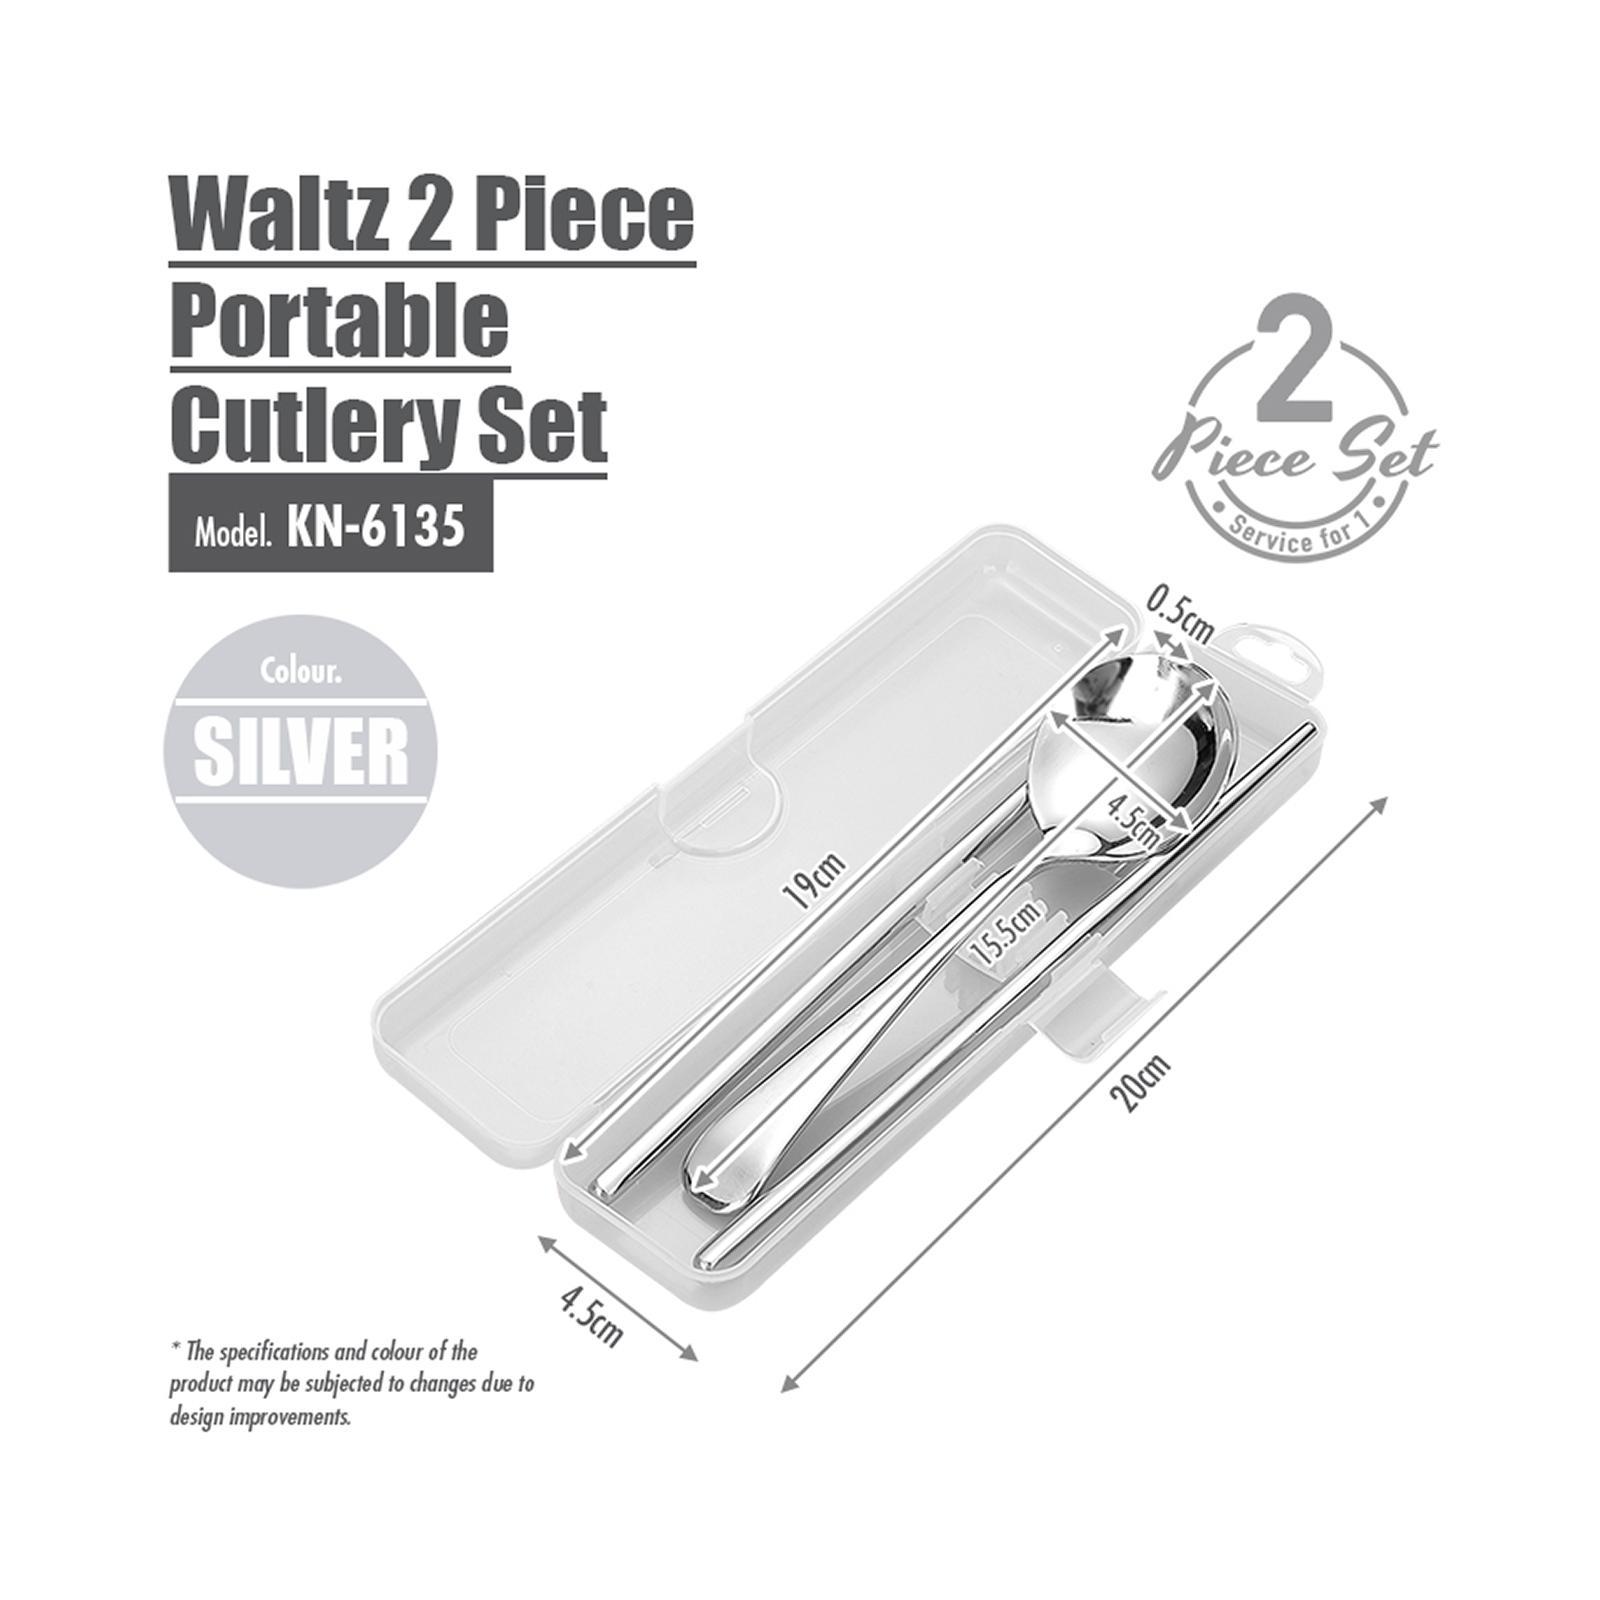 HOUZE Waltz 2 Piece Portable Cutlery Set - Silver